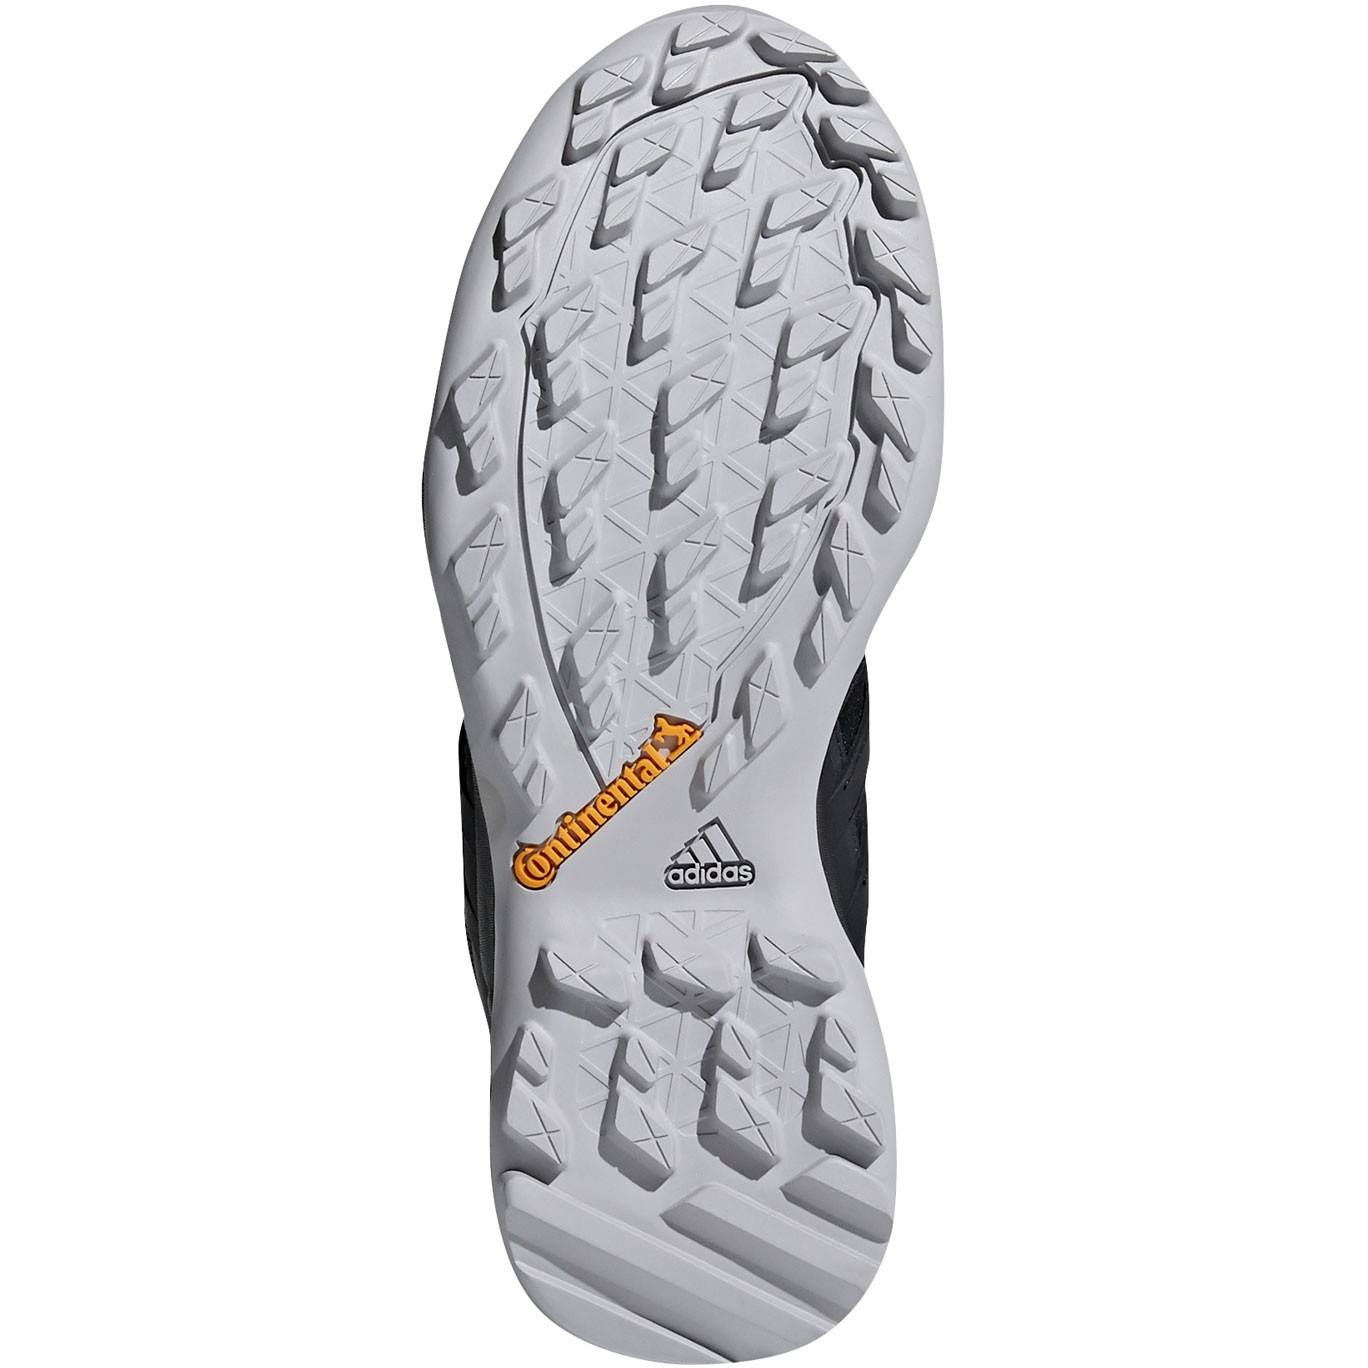 Adidas Terrex Swift R2 Mid GTX Women's Approach Shoe - Core Black/Ash Green